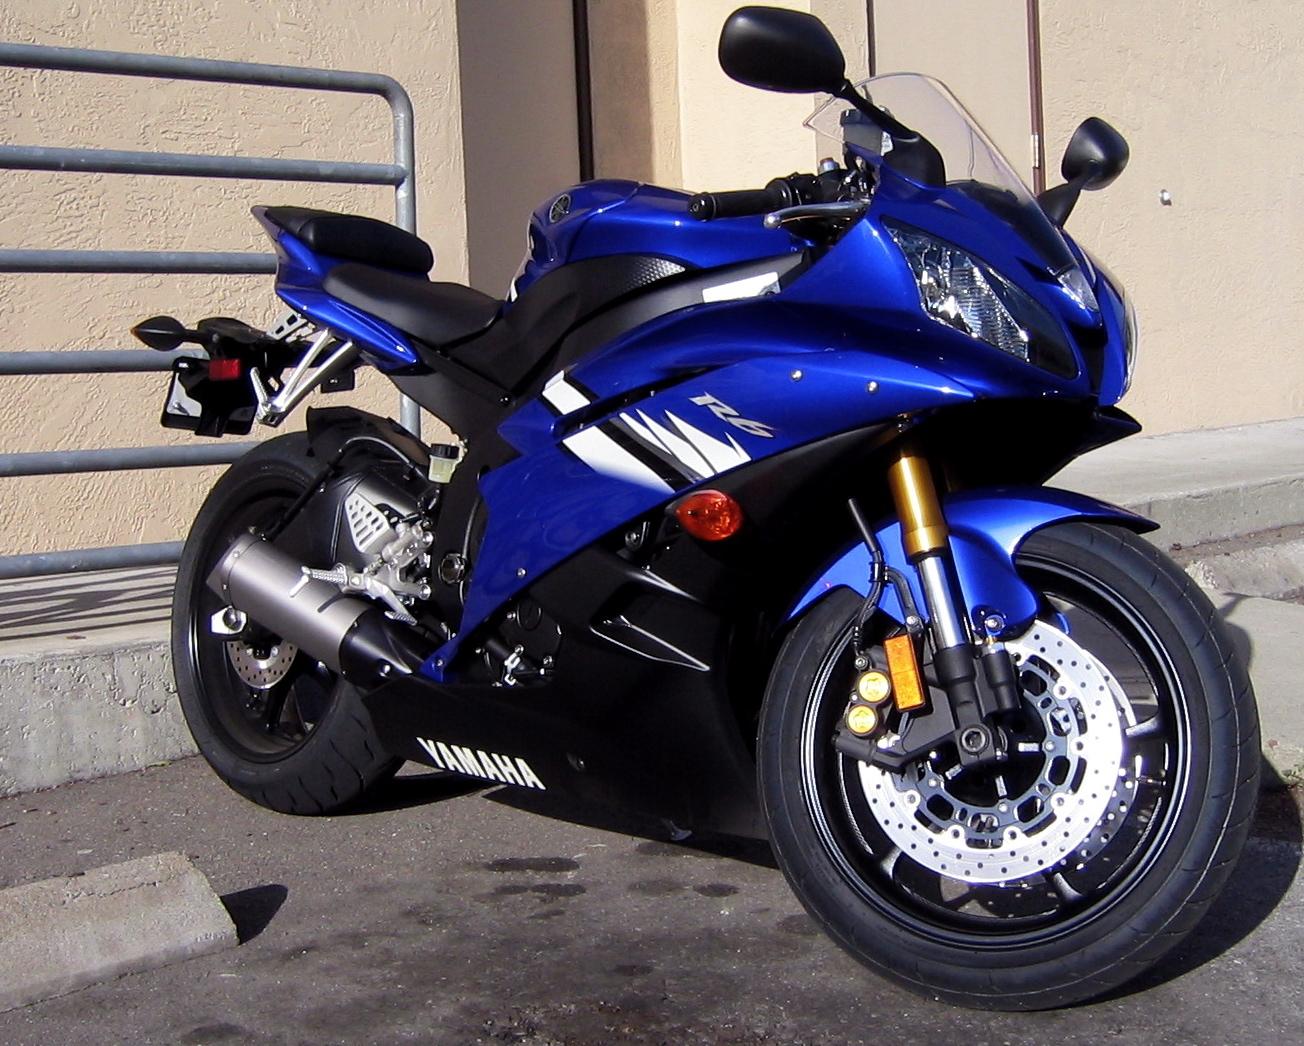 Yamaha Waverunner Price